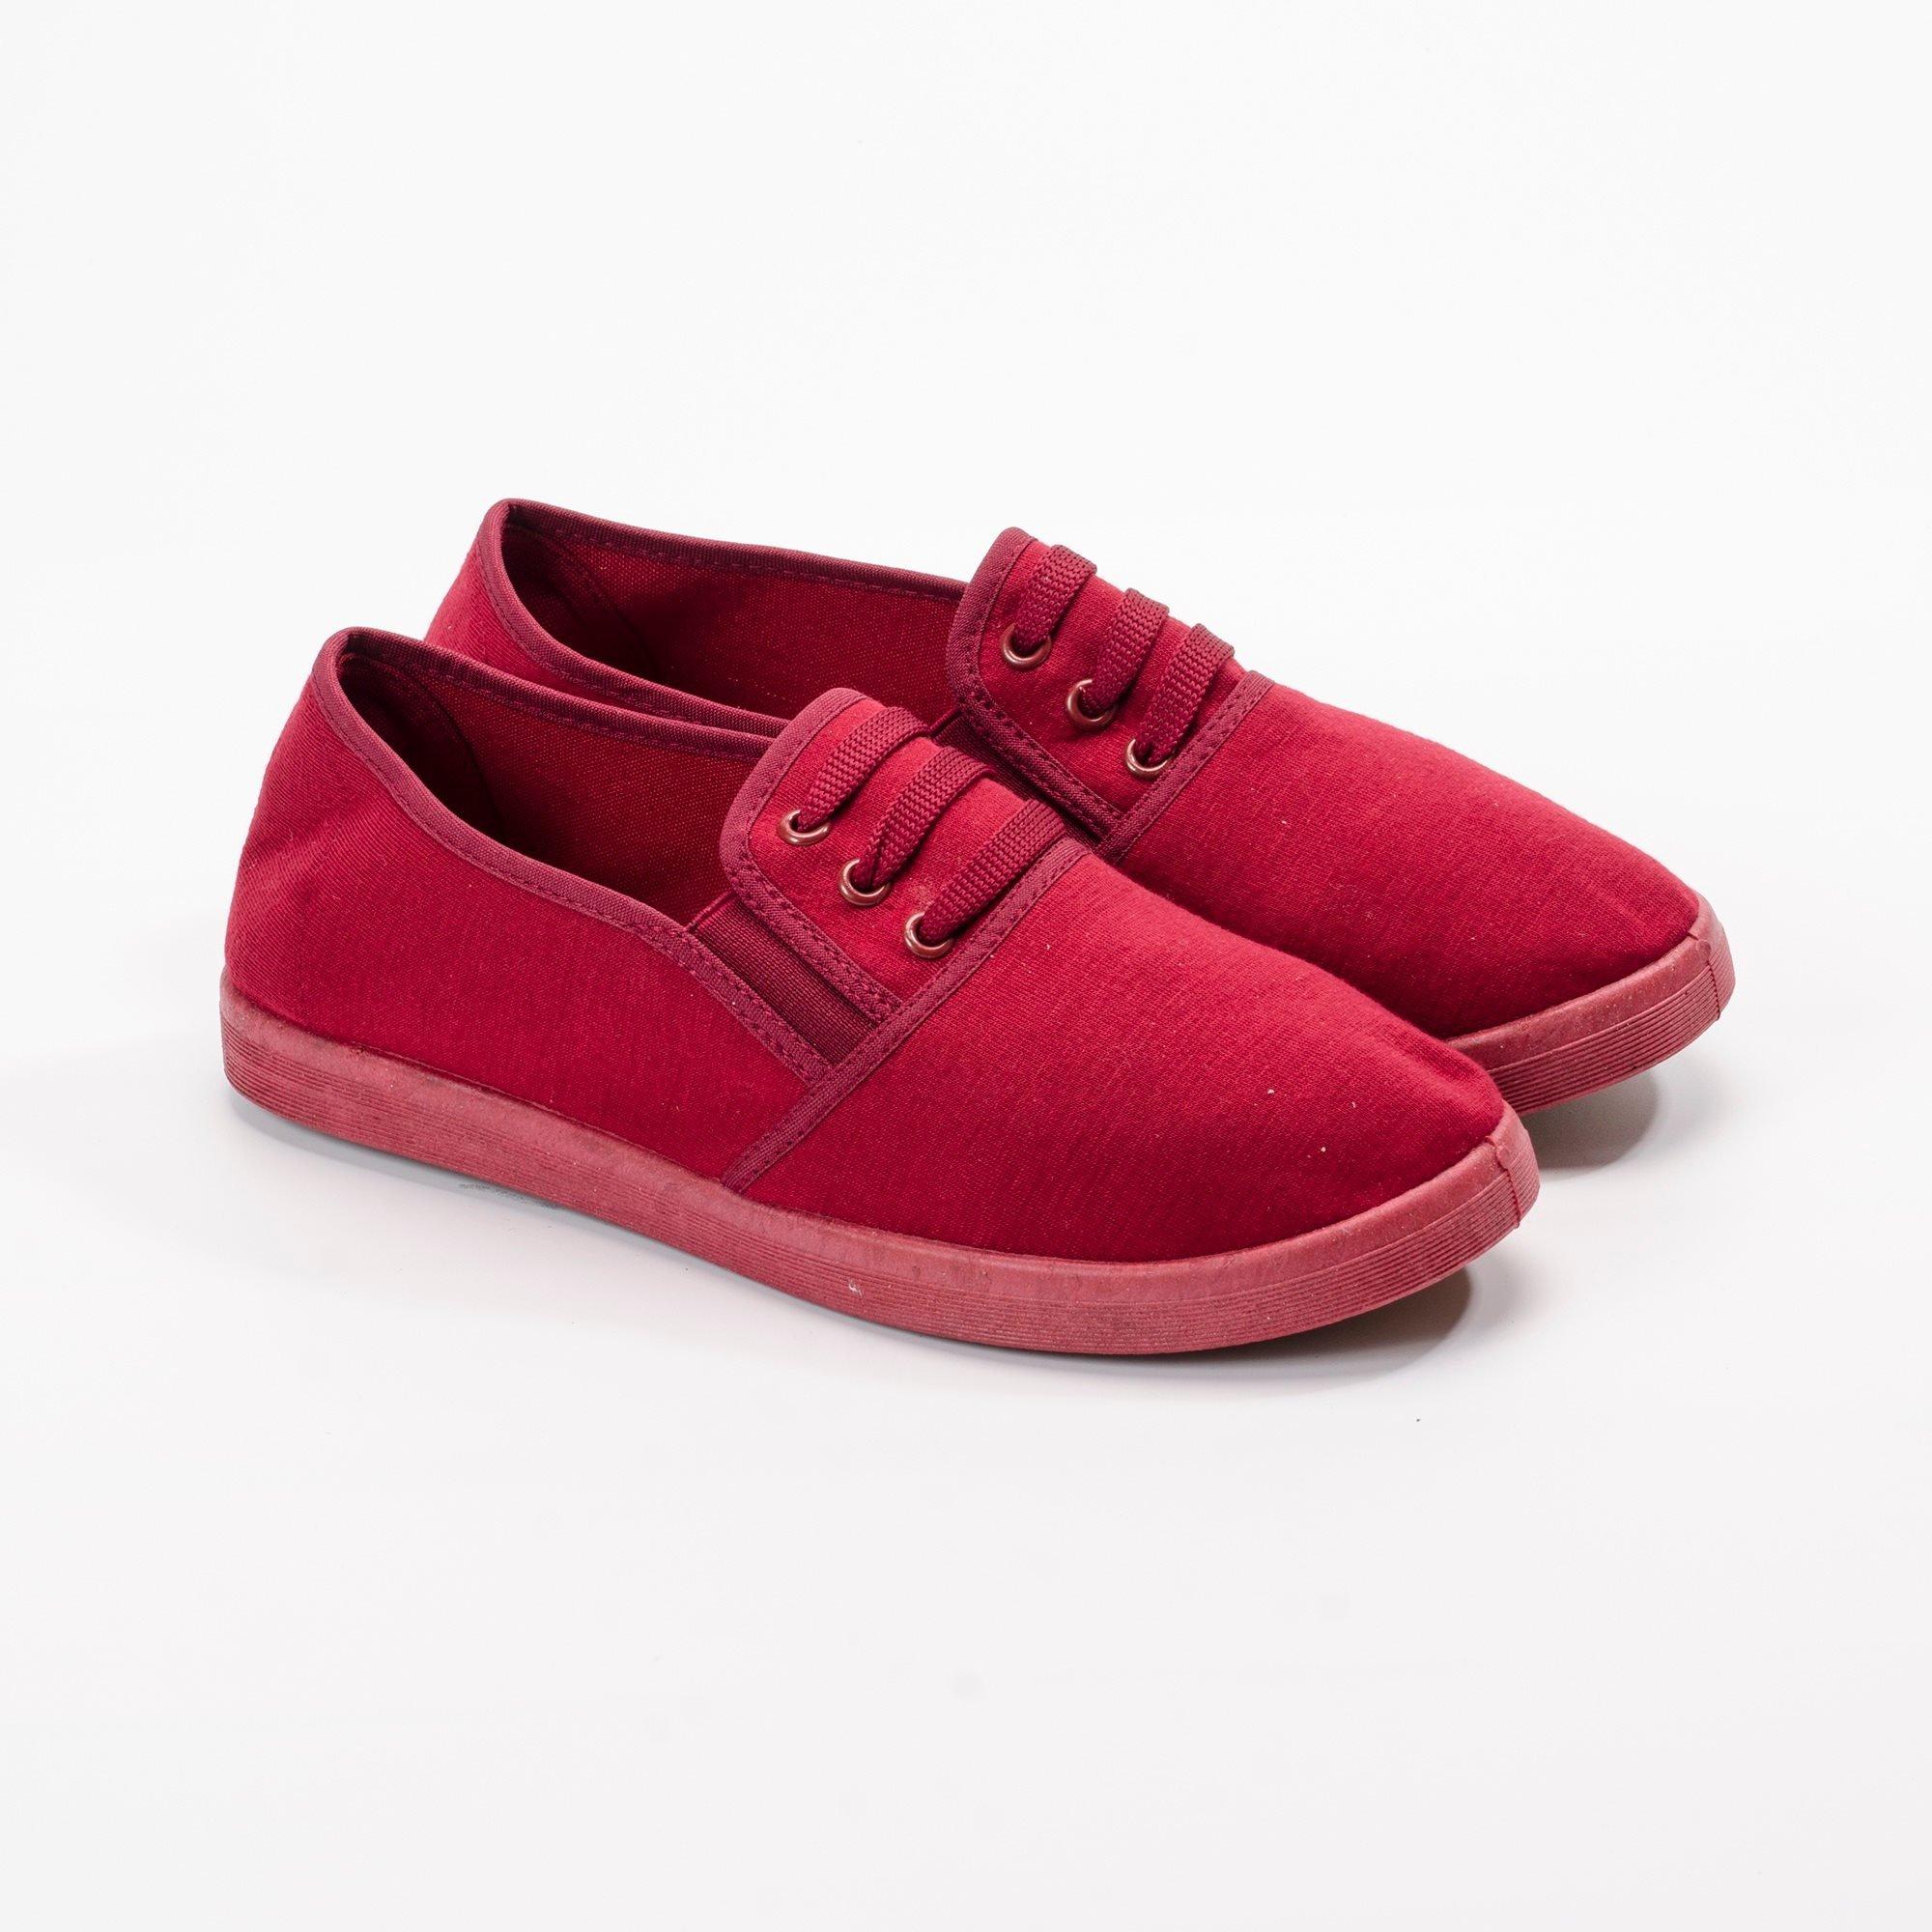 Giày Slipon nữ  MWC NUSL- 1511